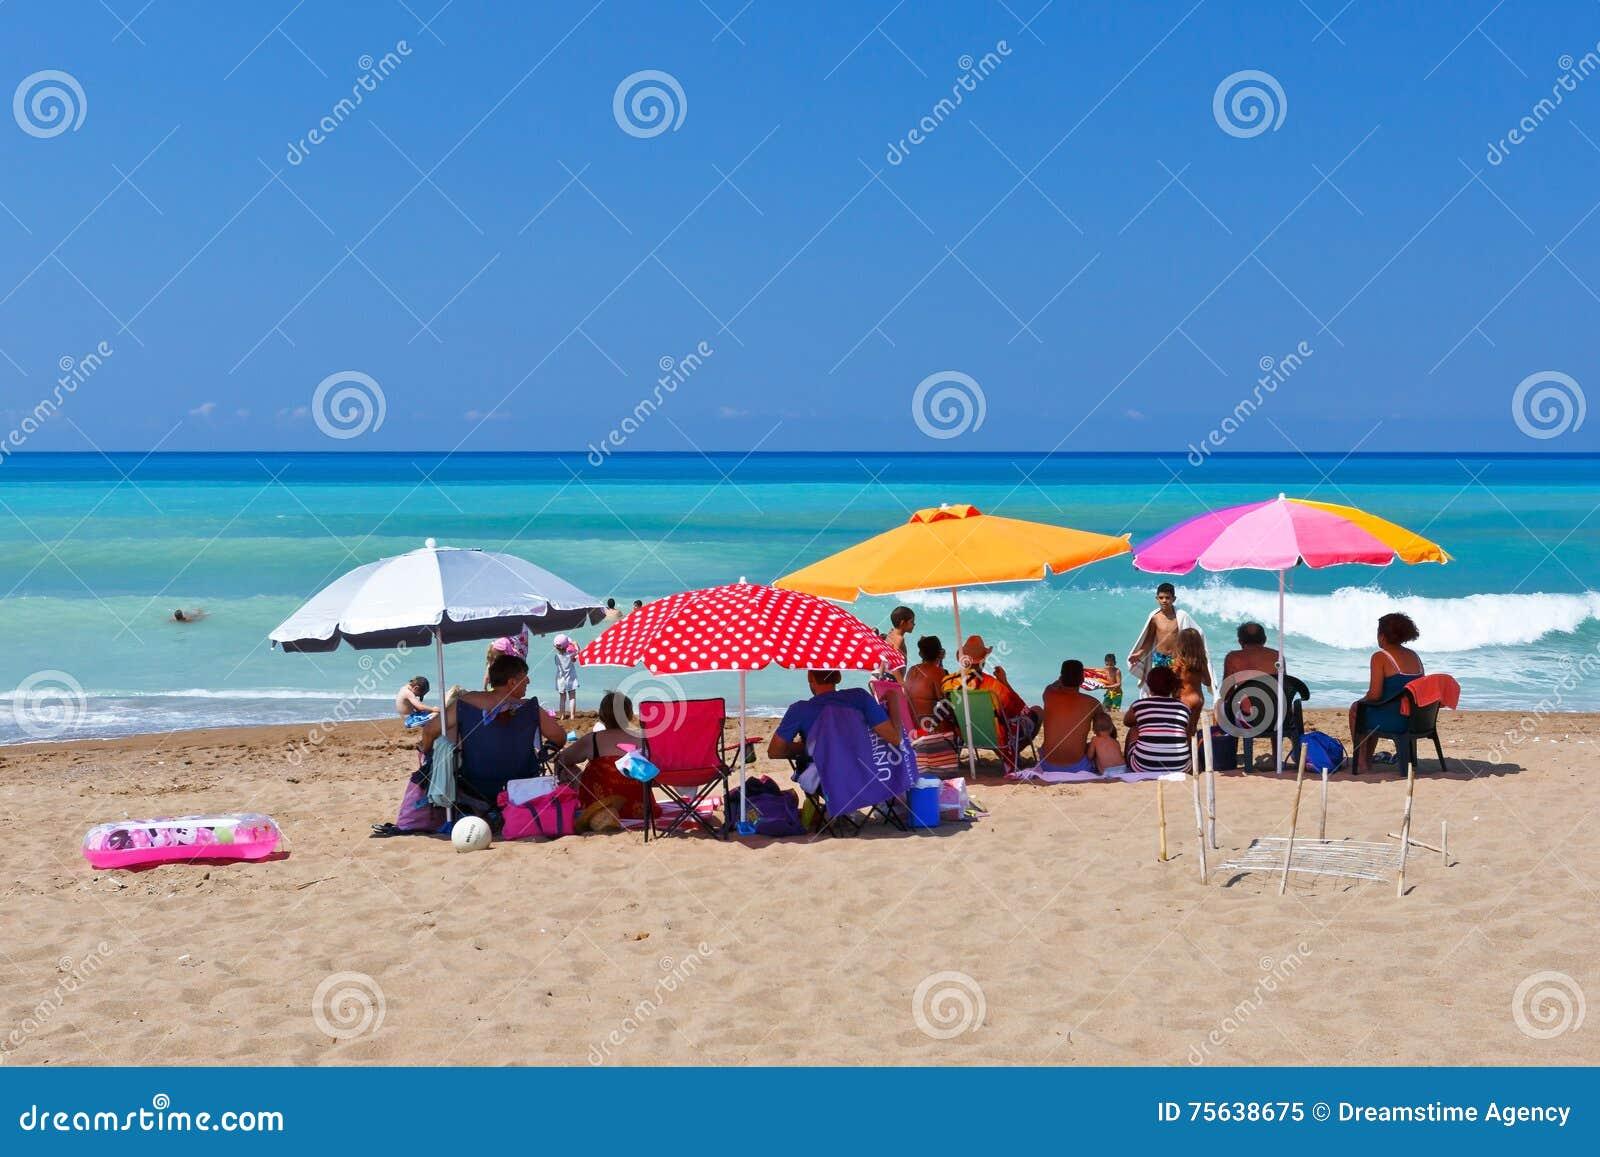 Older Man Sunbathing On A Lilo Stock Photo - Image of